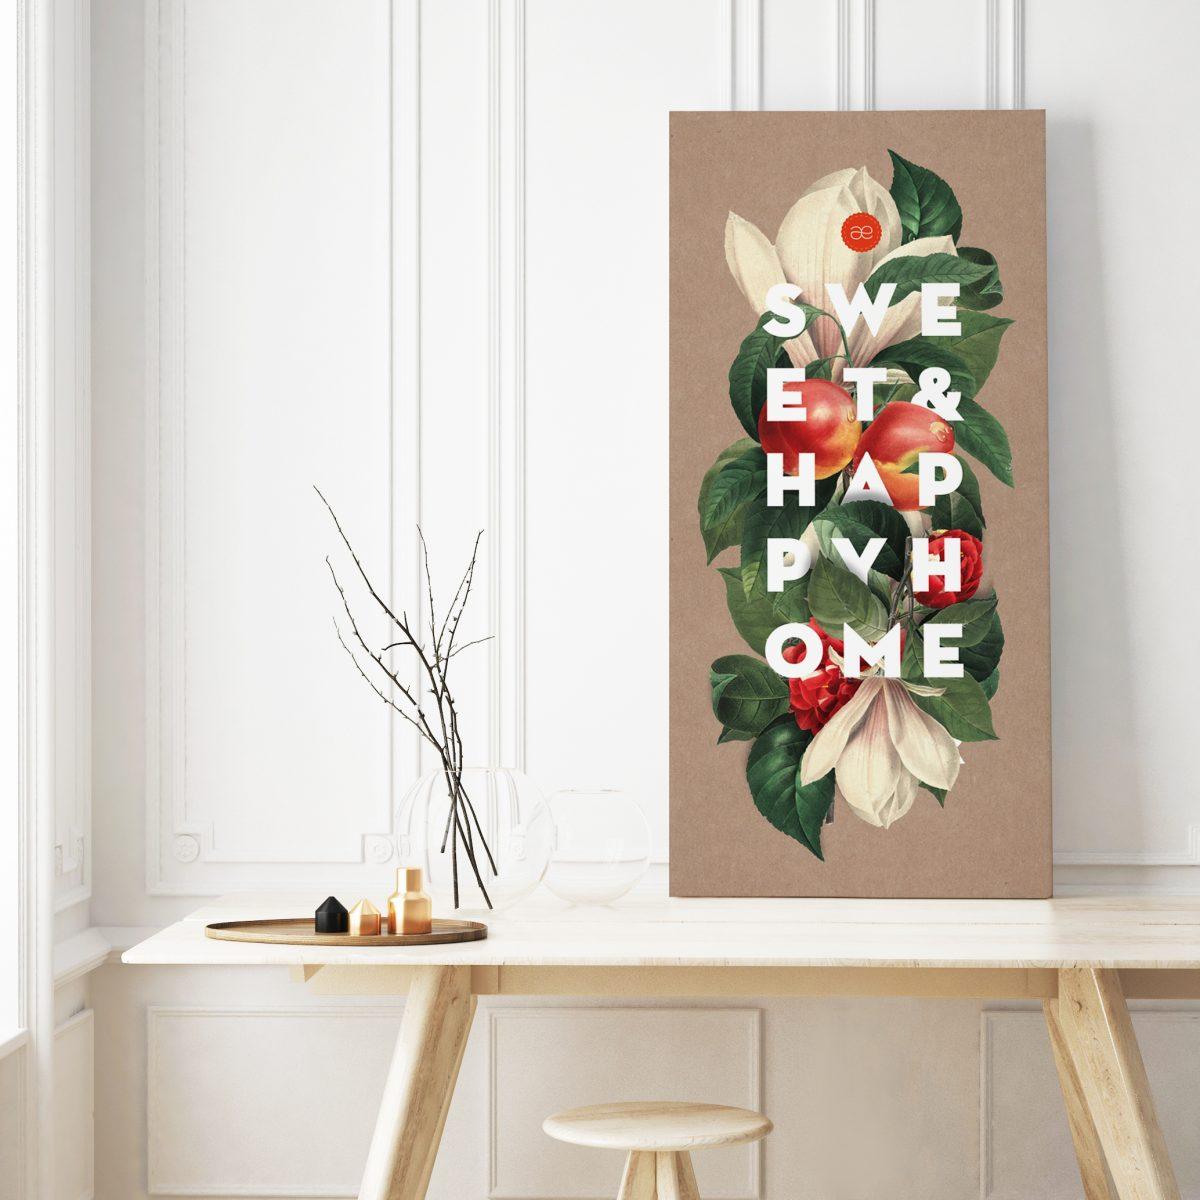 mock up poster frame in hipster room, scandinavian style interior